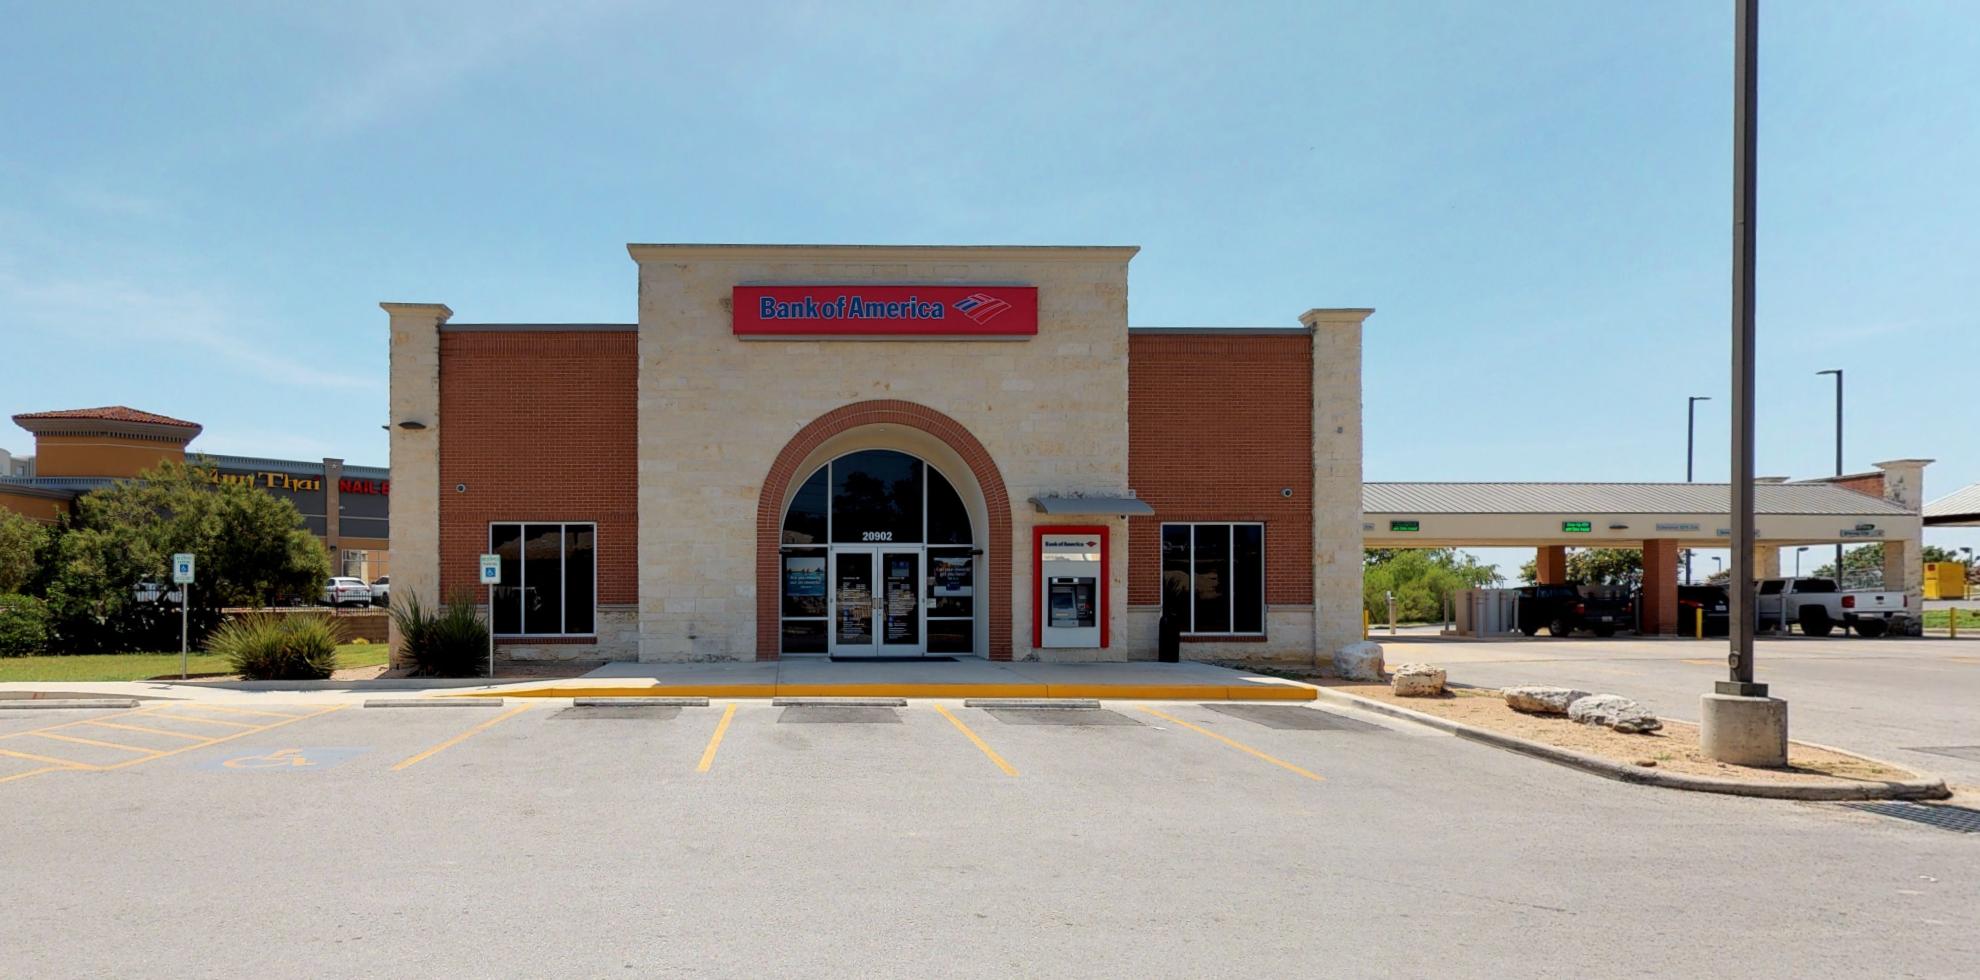 Bank of America financial center with drive-thru ATM   20902 US Highway 281 N, San Antonio, TX 78258